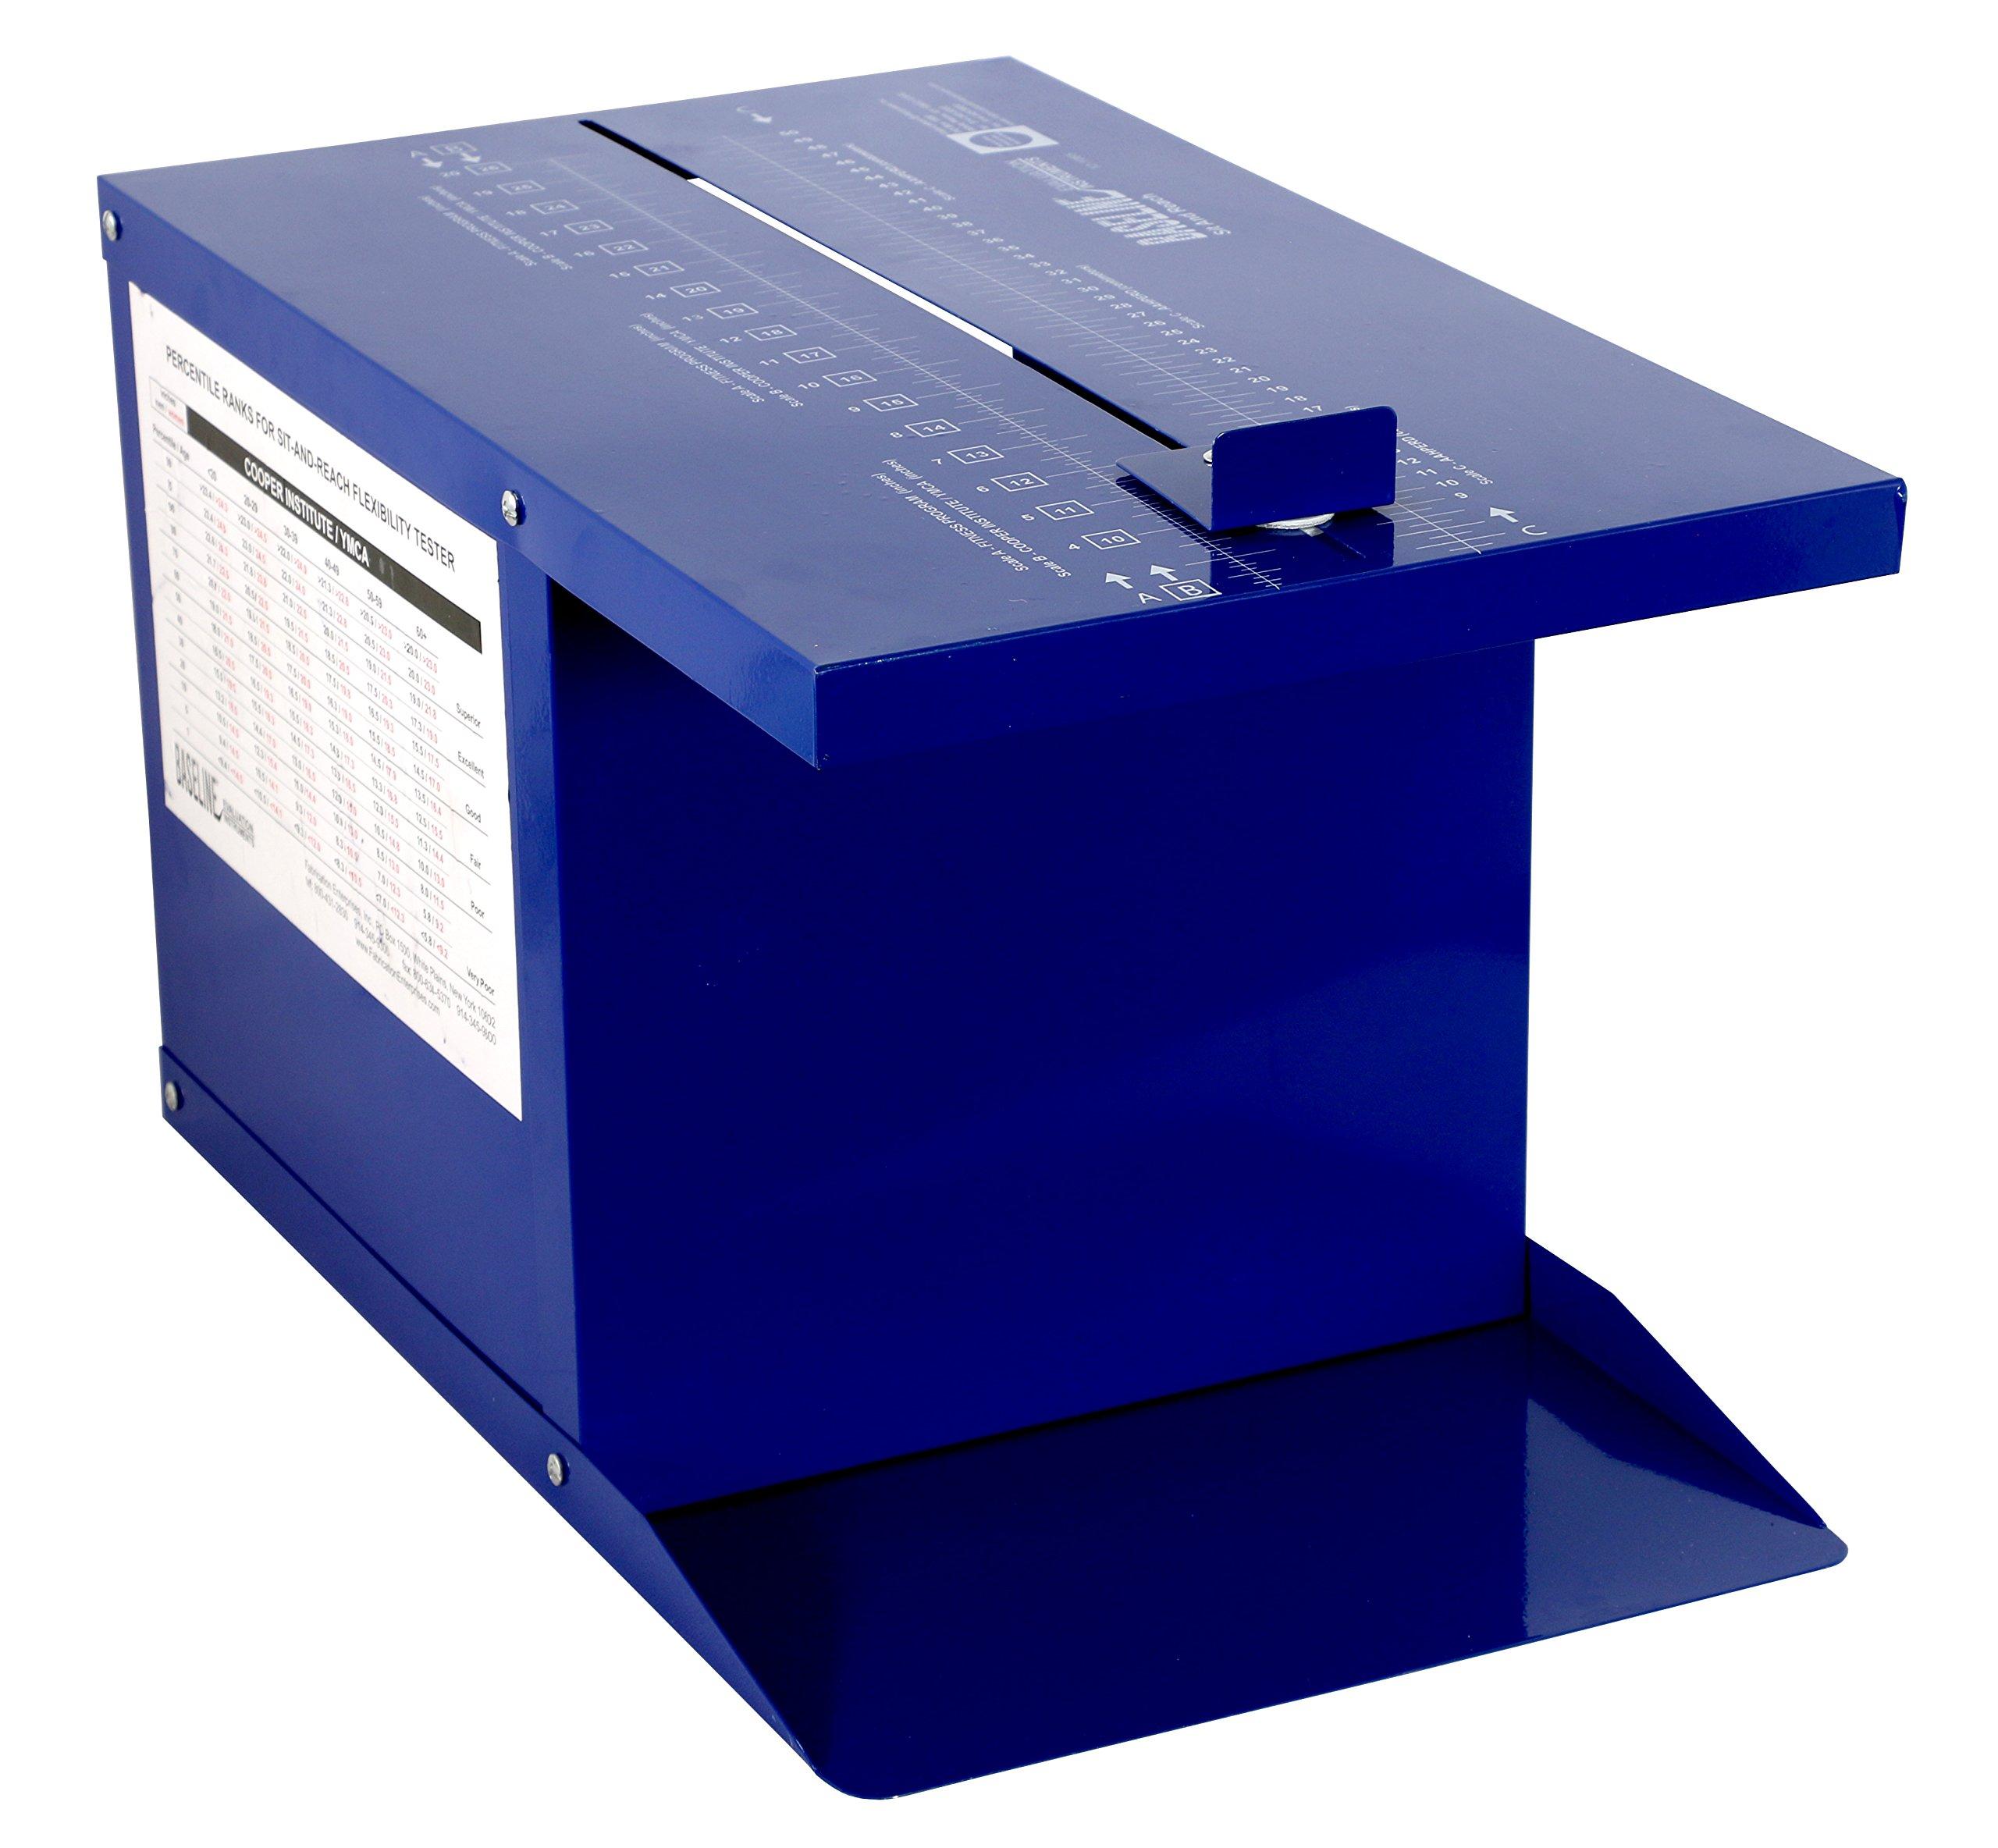 Baseline 12-1085 Sit n' Reach Trunk Flexibility Box